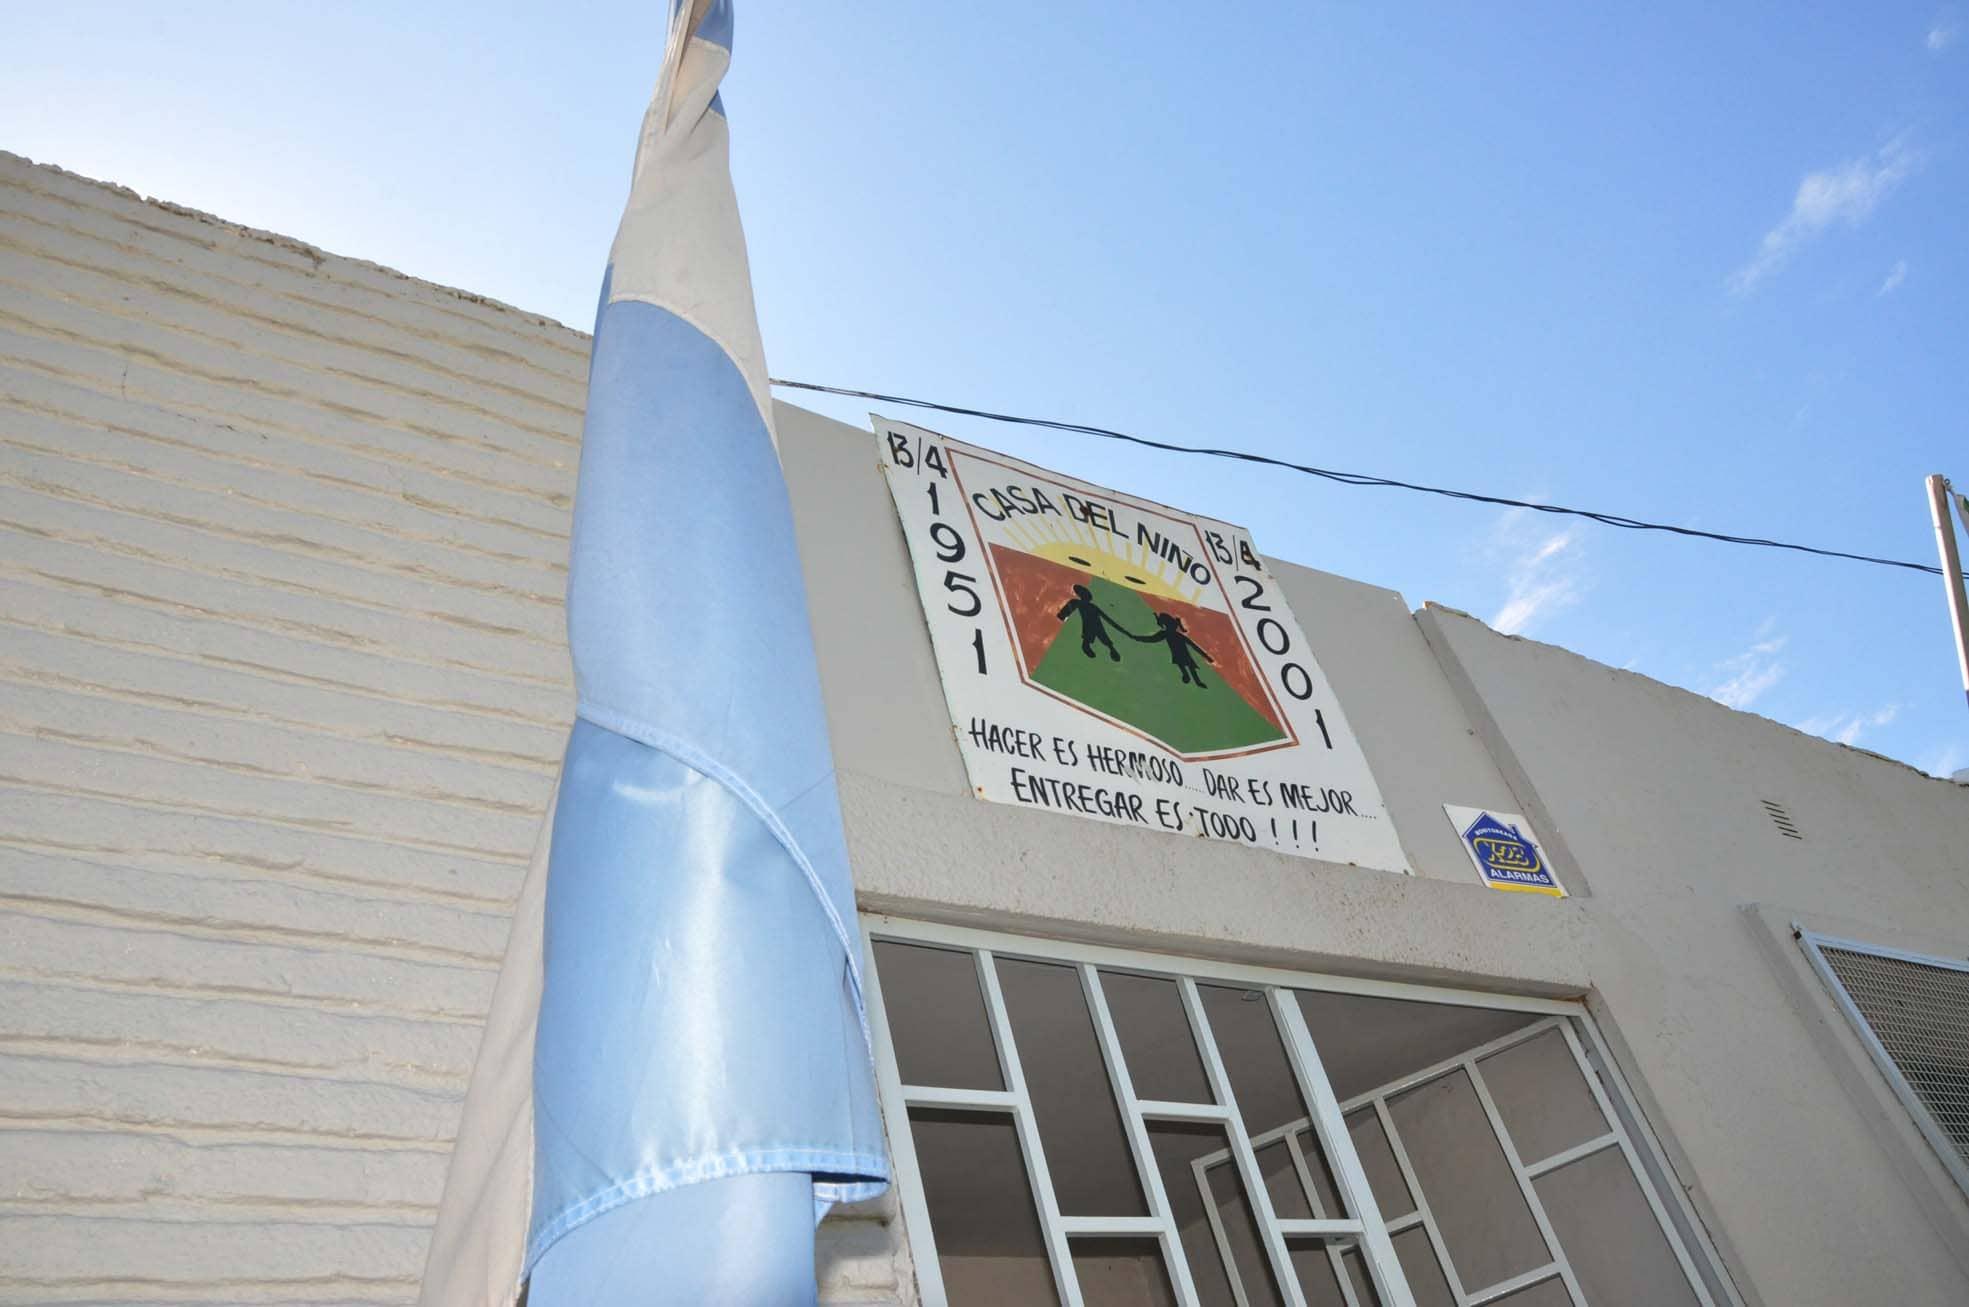 Casa del Niño celebra su 65 aniversario